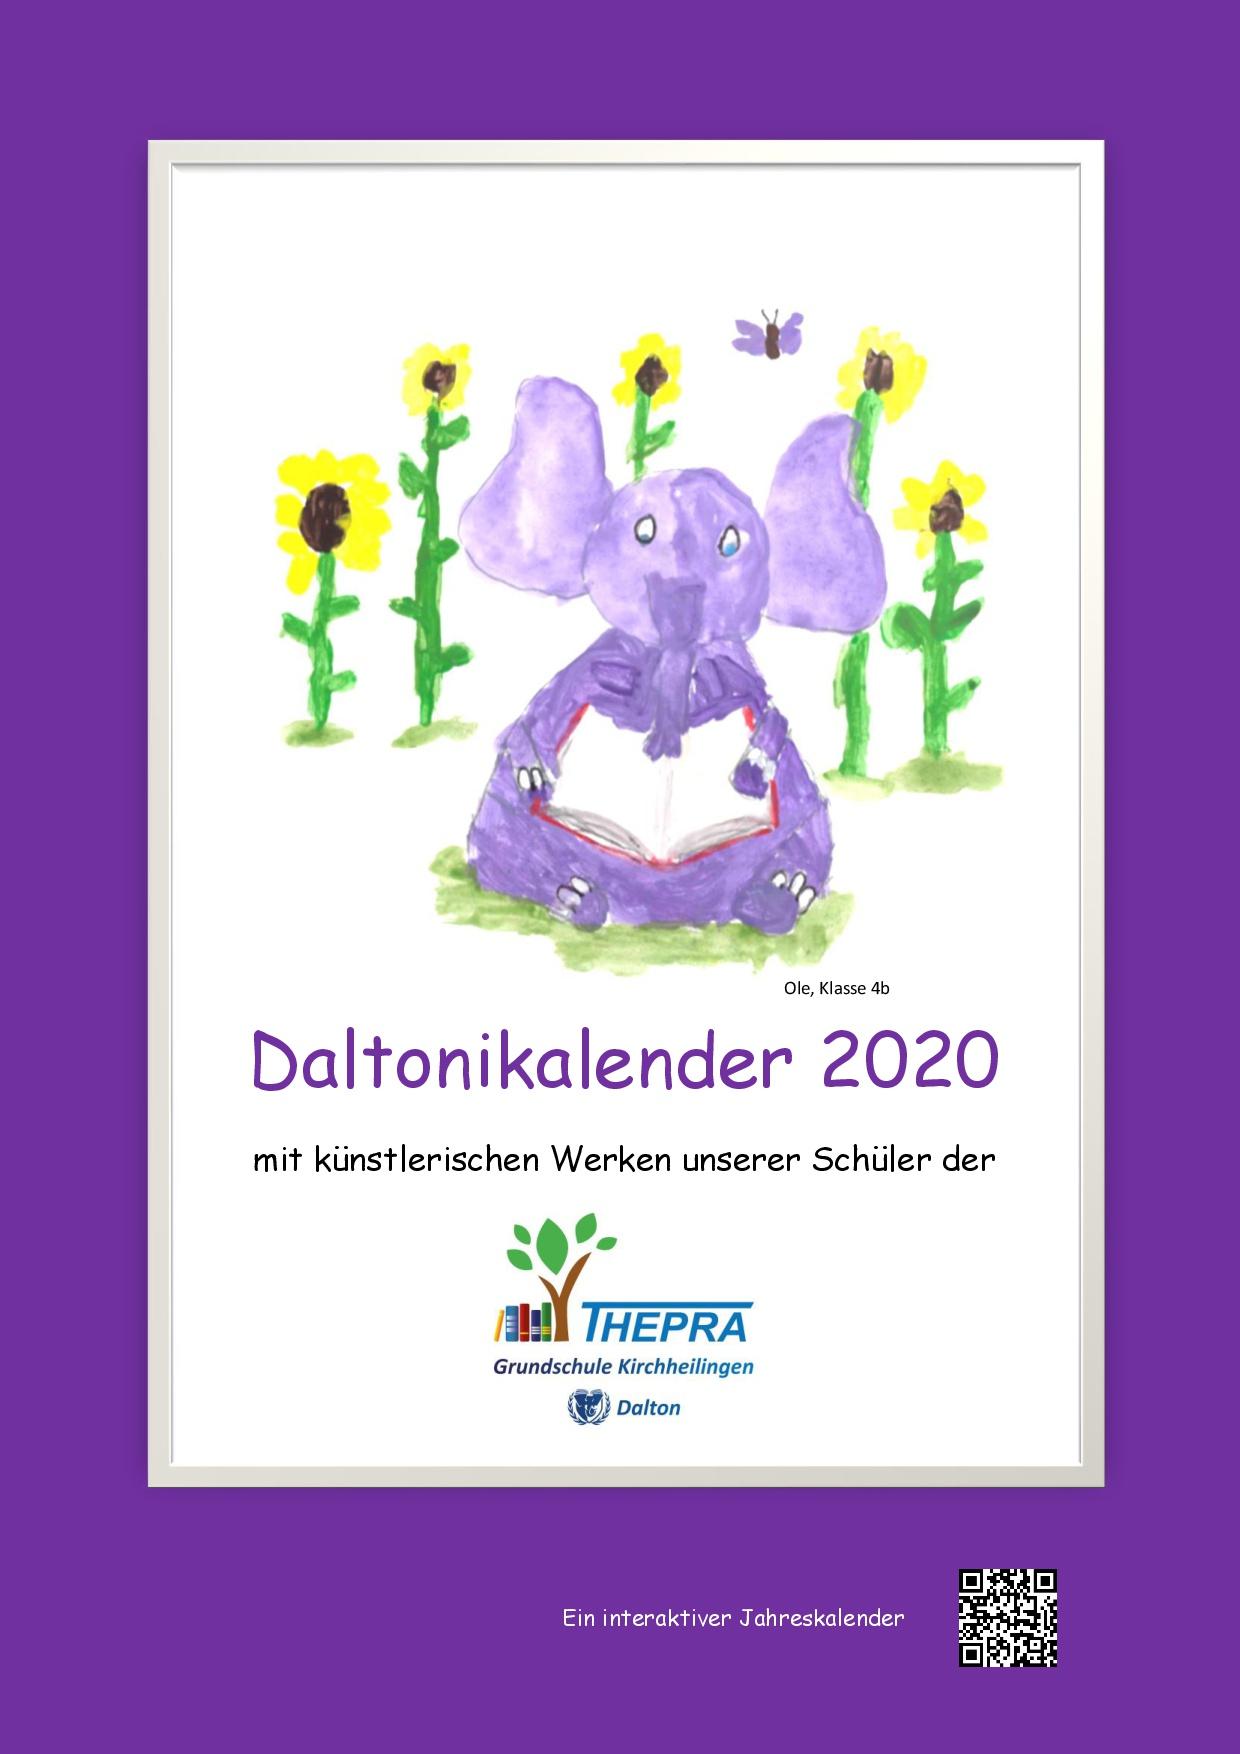 Daltonikalender_2020-001